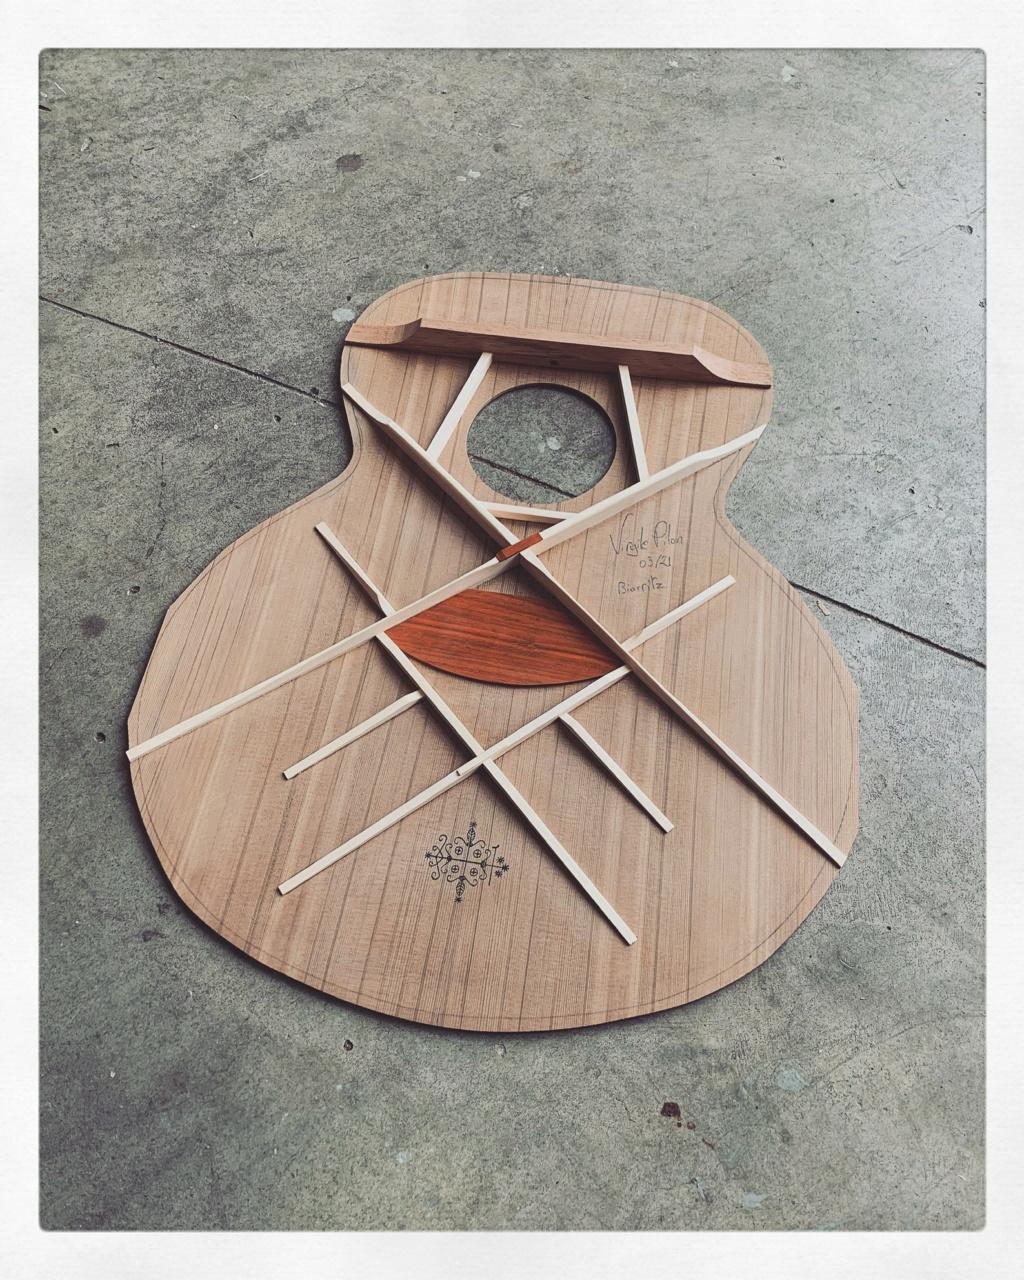 Blind guitars 4adcb010